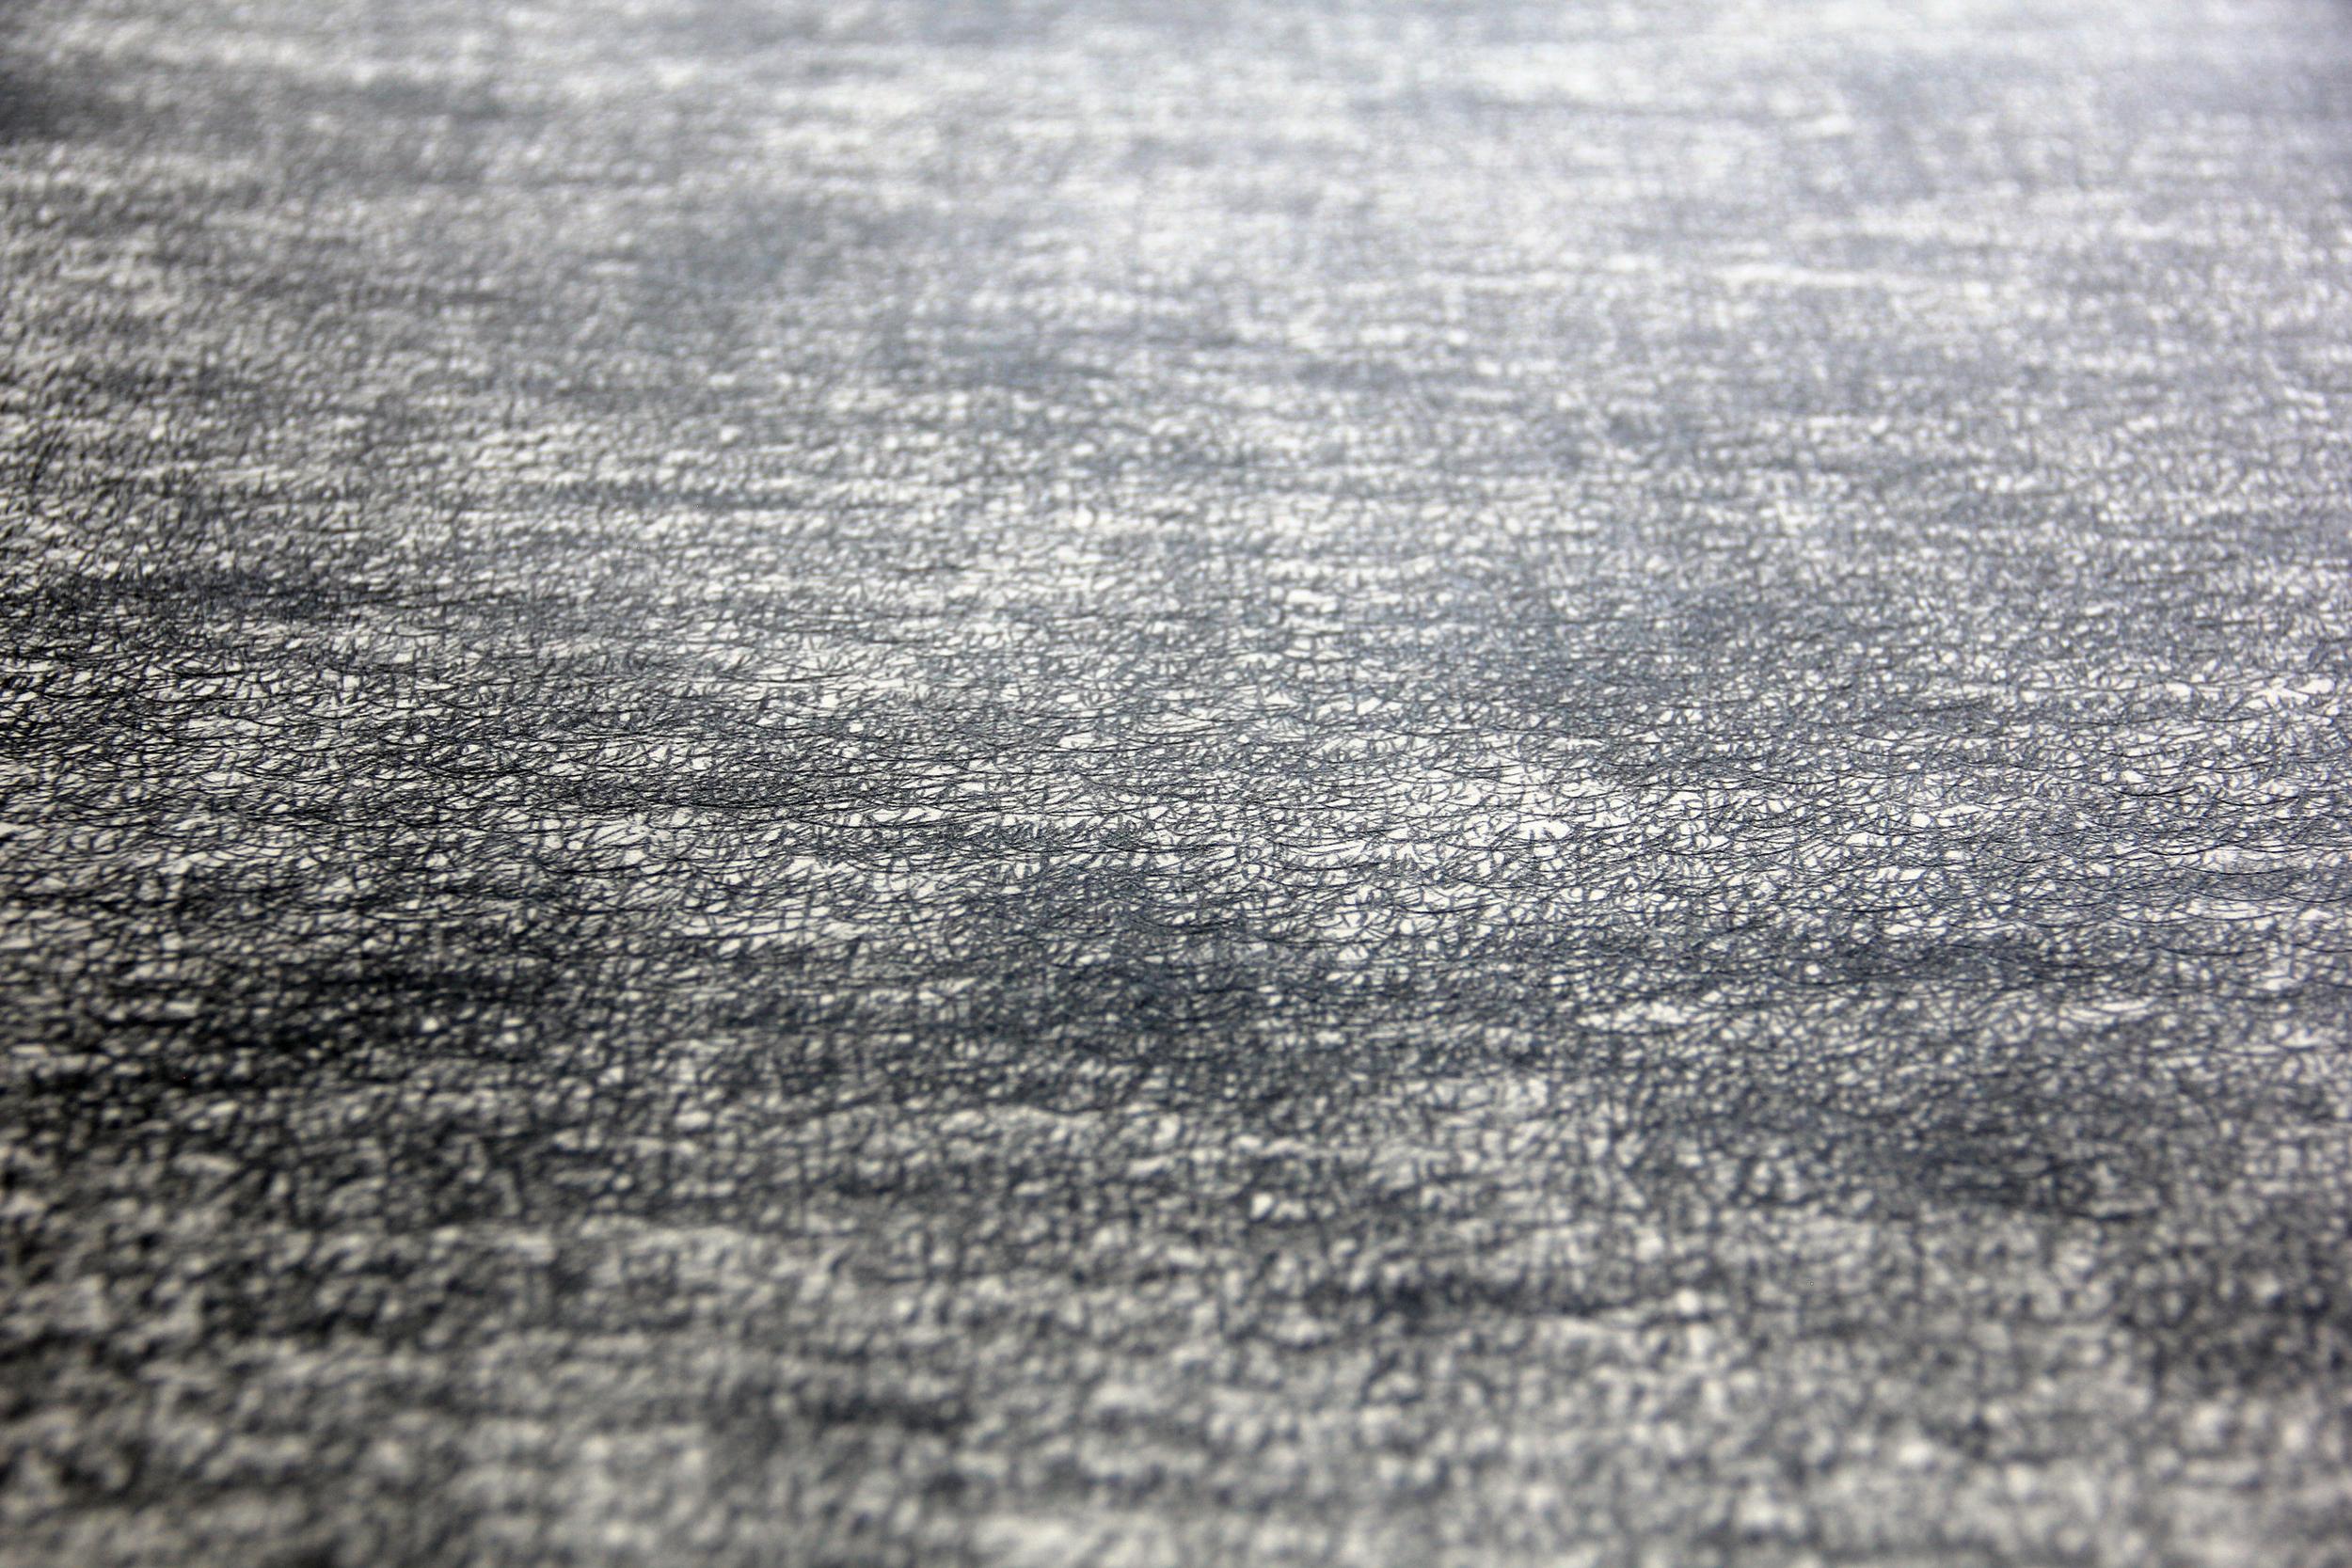 Yun Shin,  Record #02 , 2015, Carbon paper, 11 x 8 inches